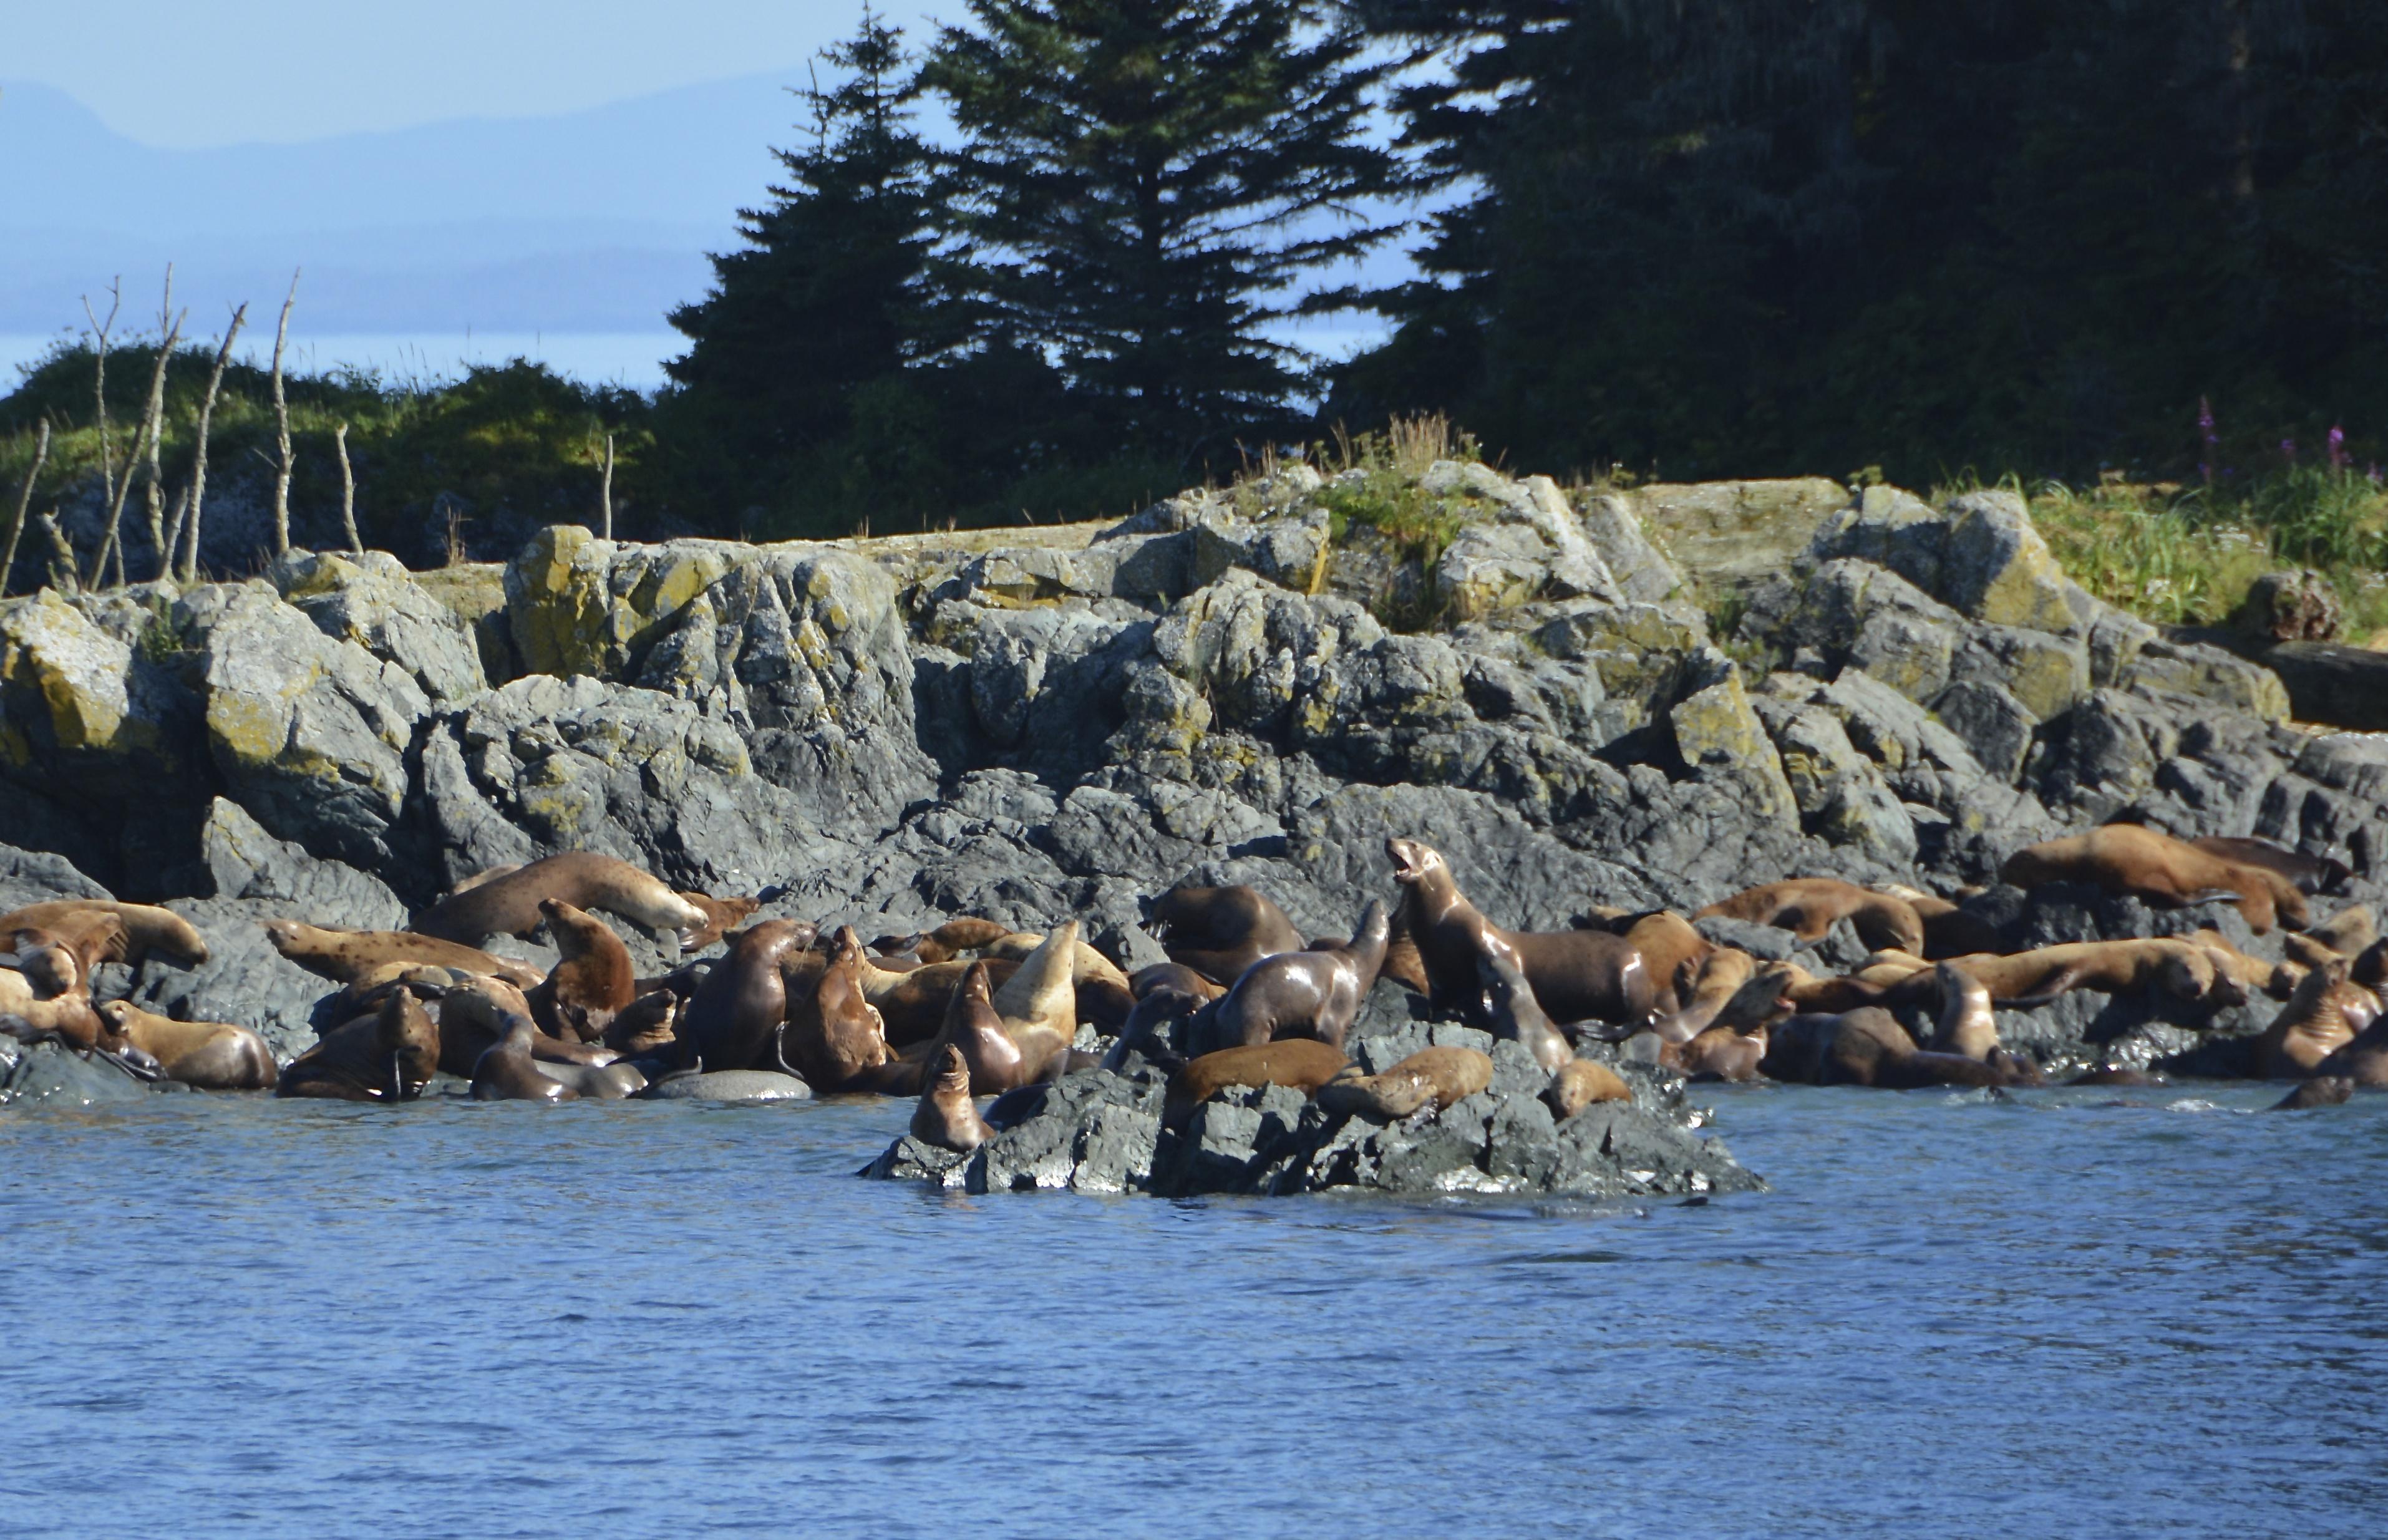 Stellar (Northern) Sea Lions at Play in southeast Alaska